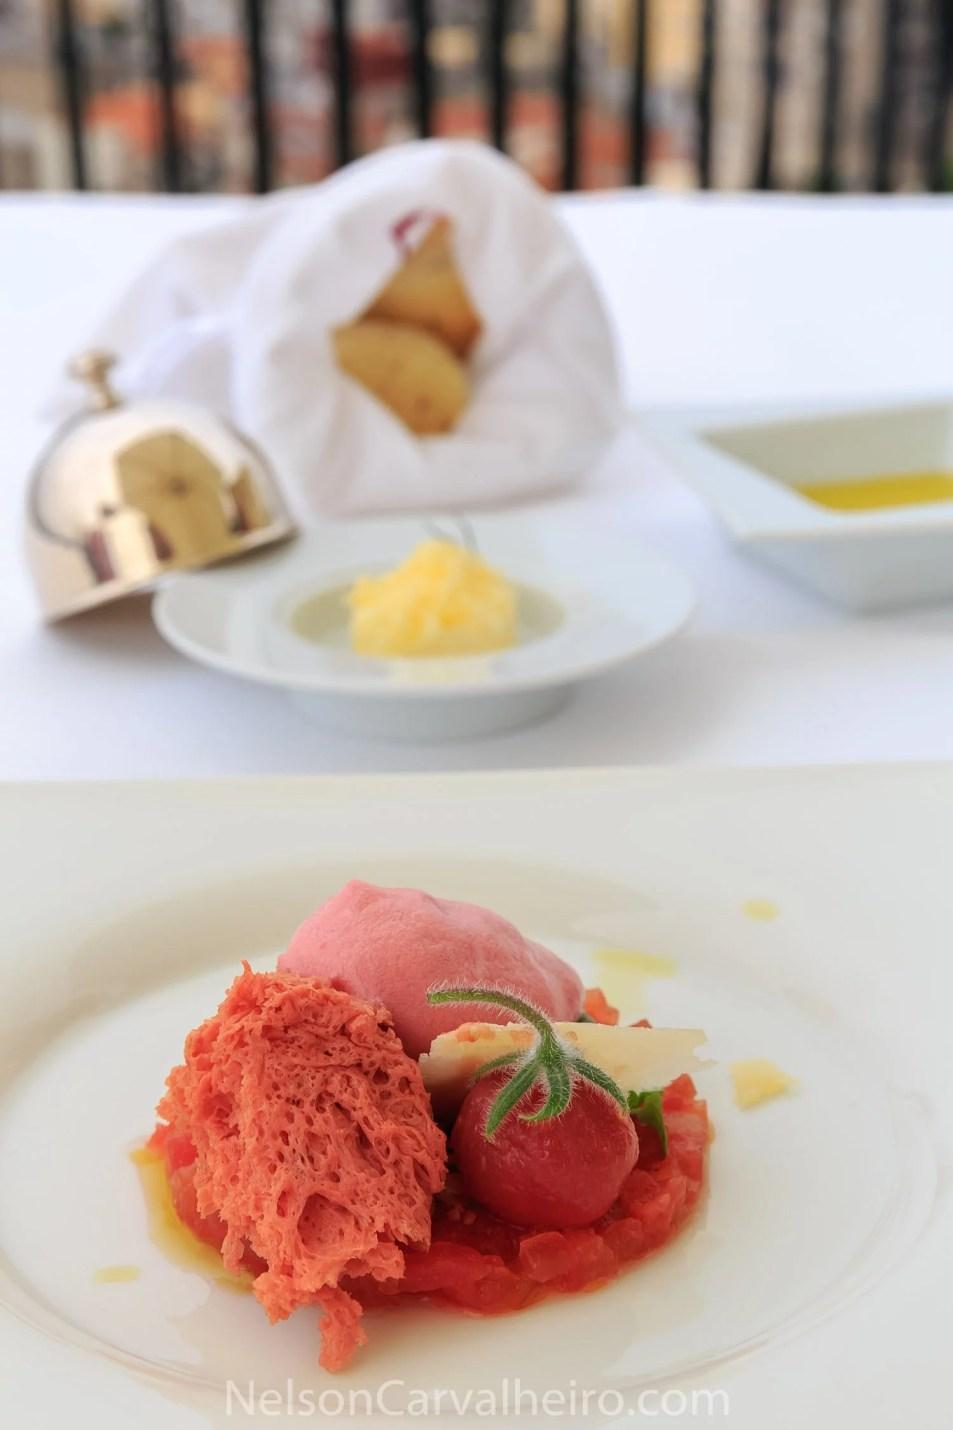 Nelson_Carvalheiro_The_Yeatman_Gastronomic_Restaurant-1-7